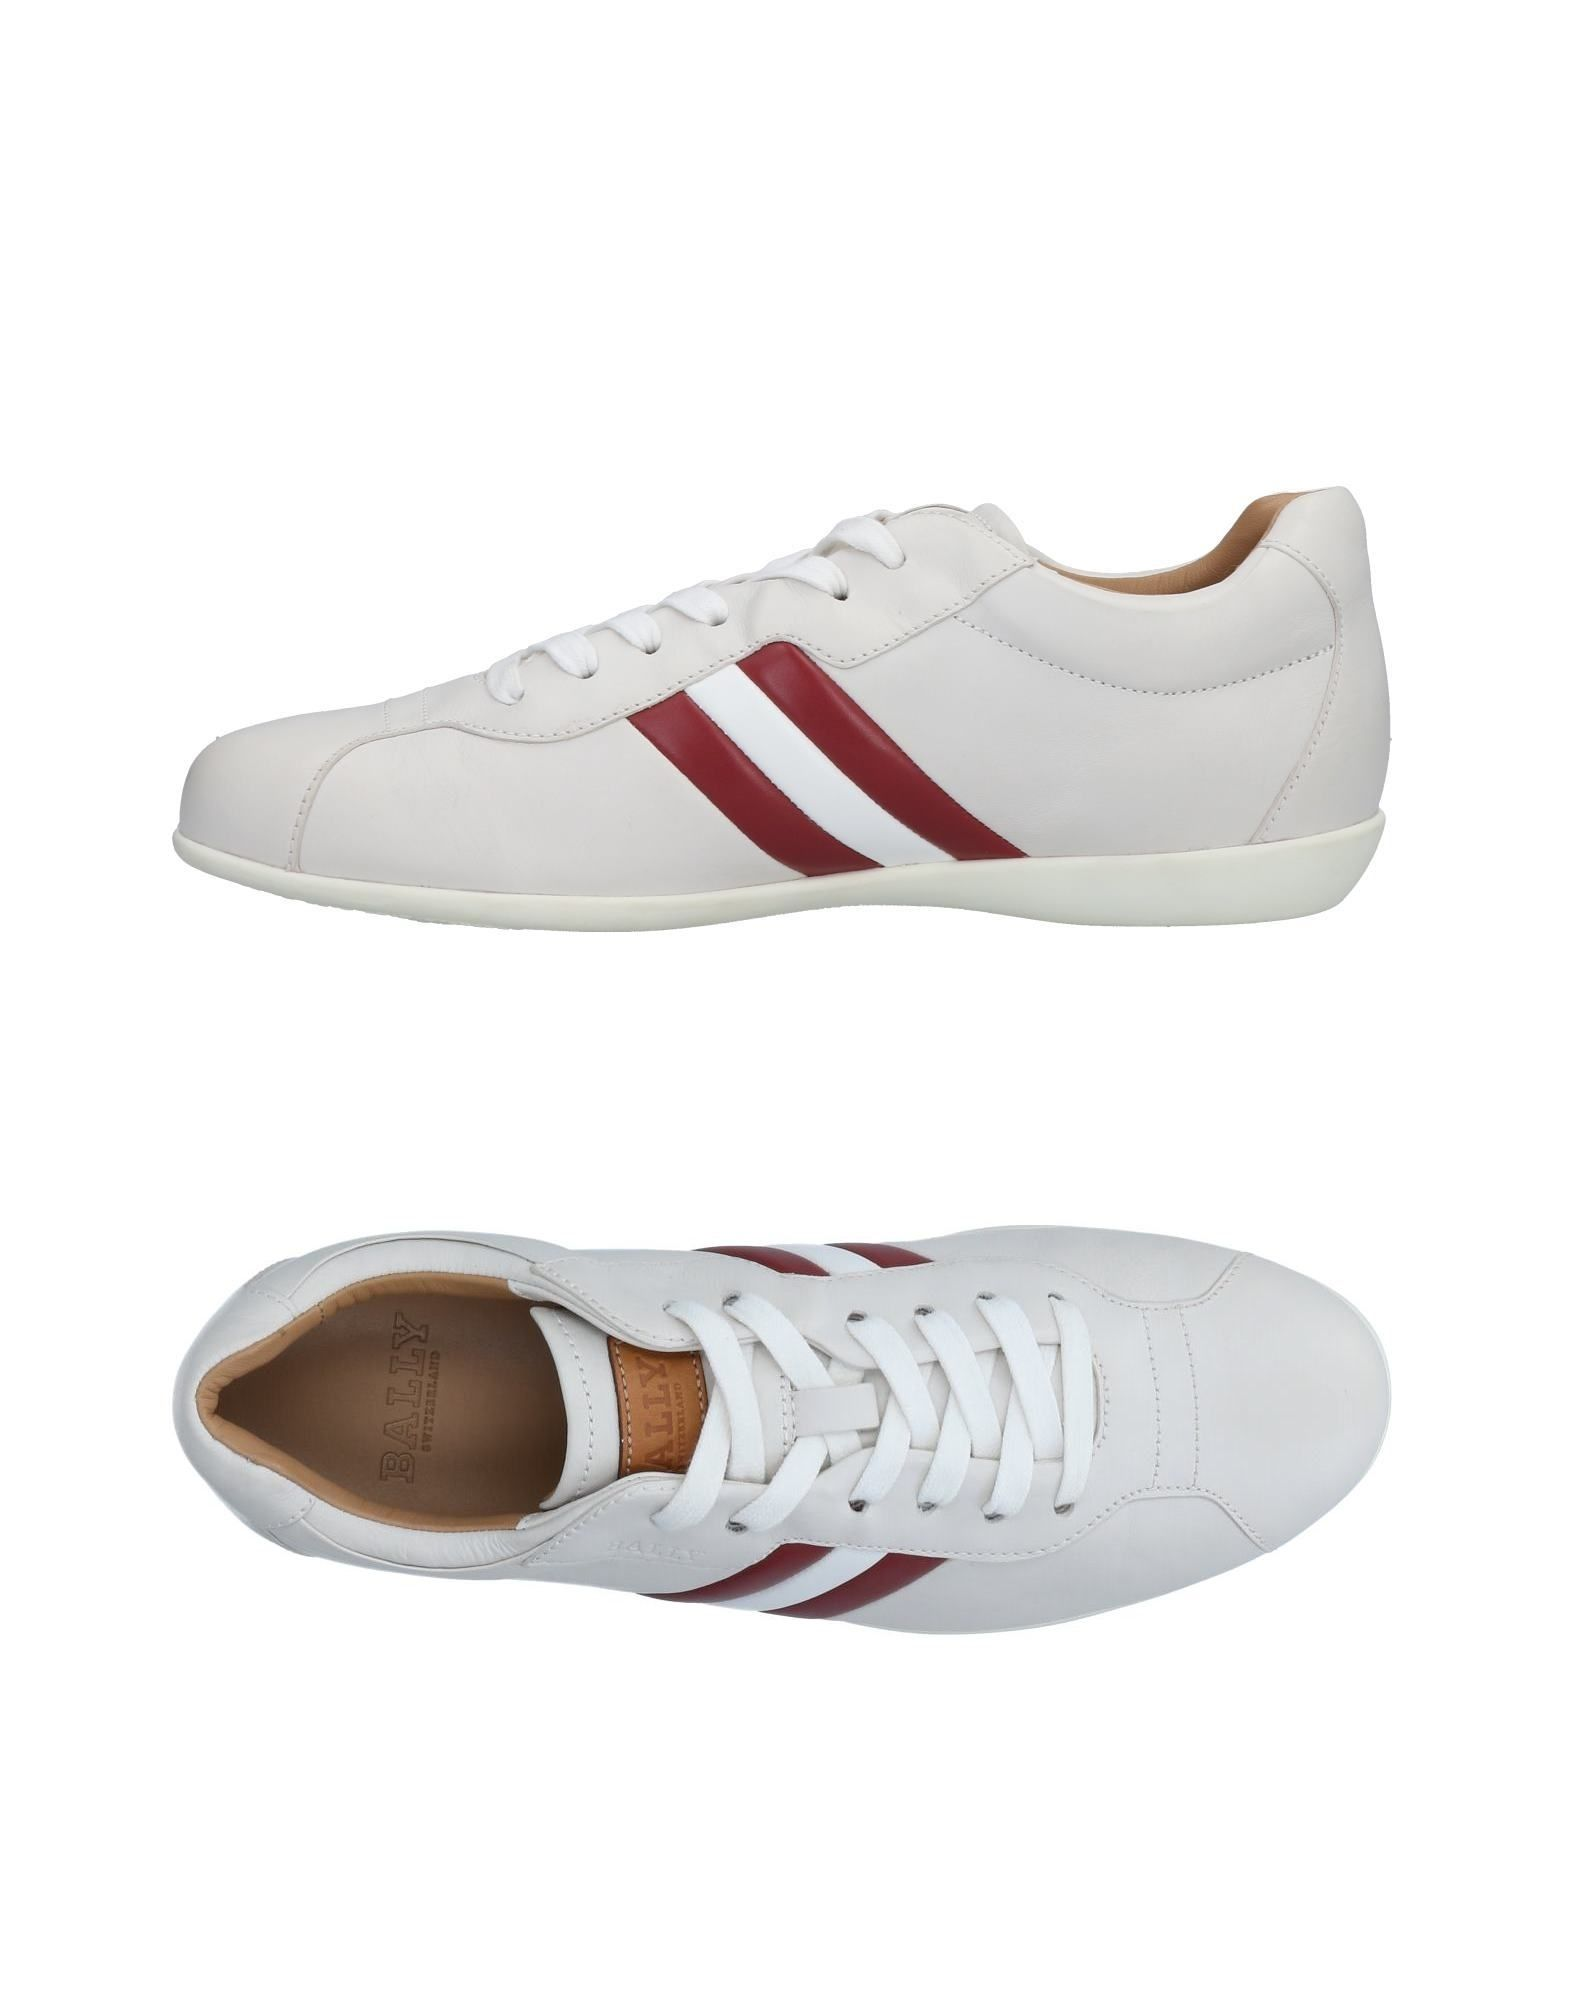 Bally Sneakers Herren  11475282RH Gute Qualität beliebte Schuhe